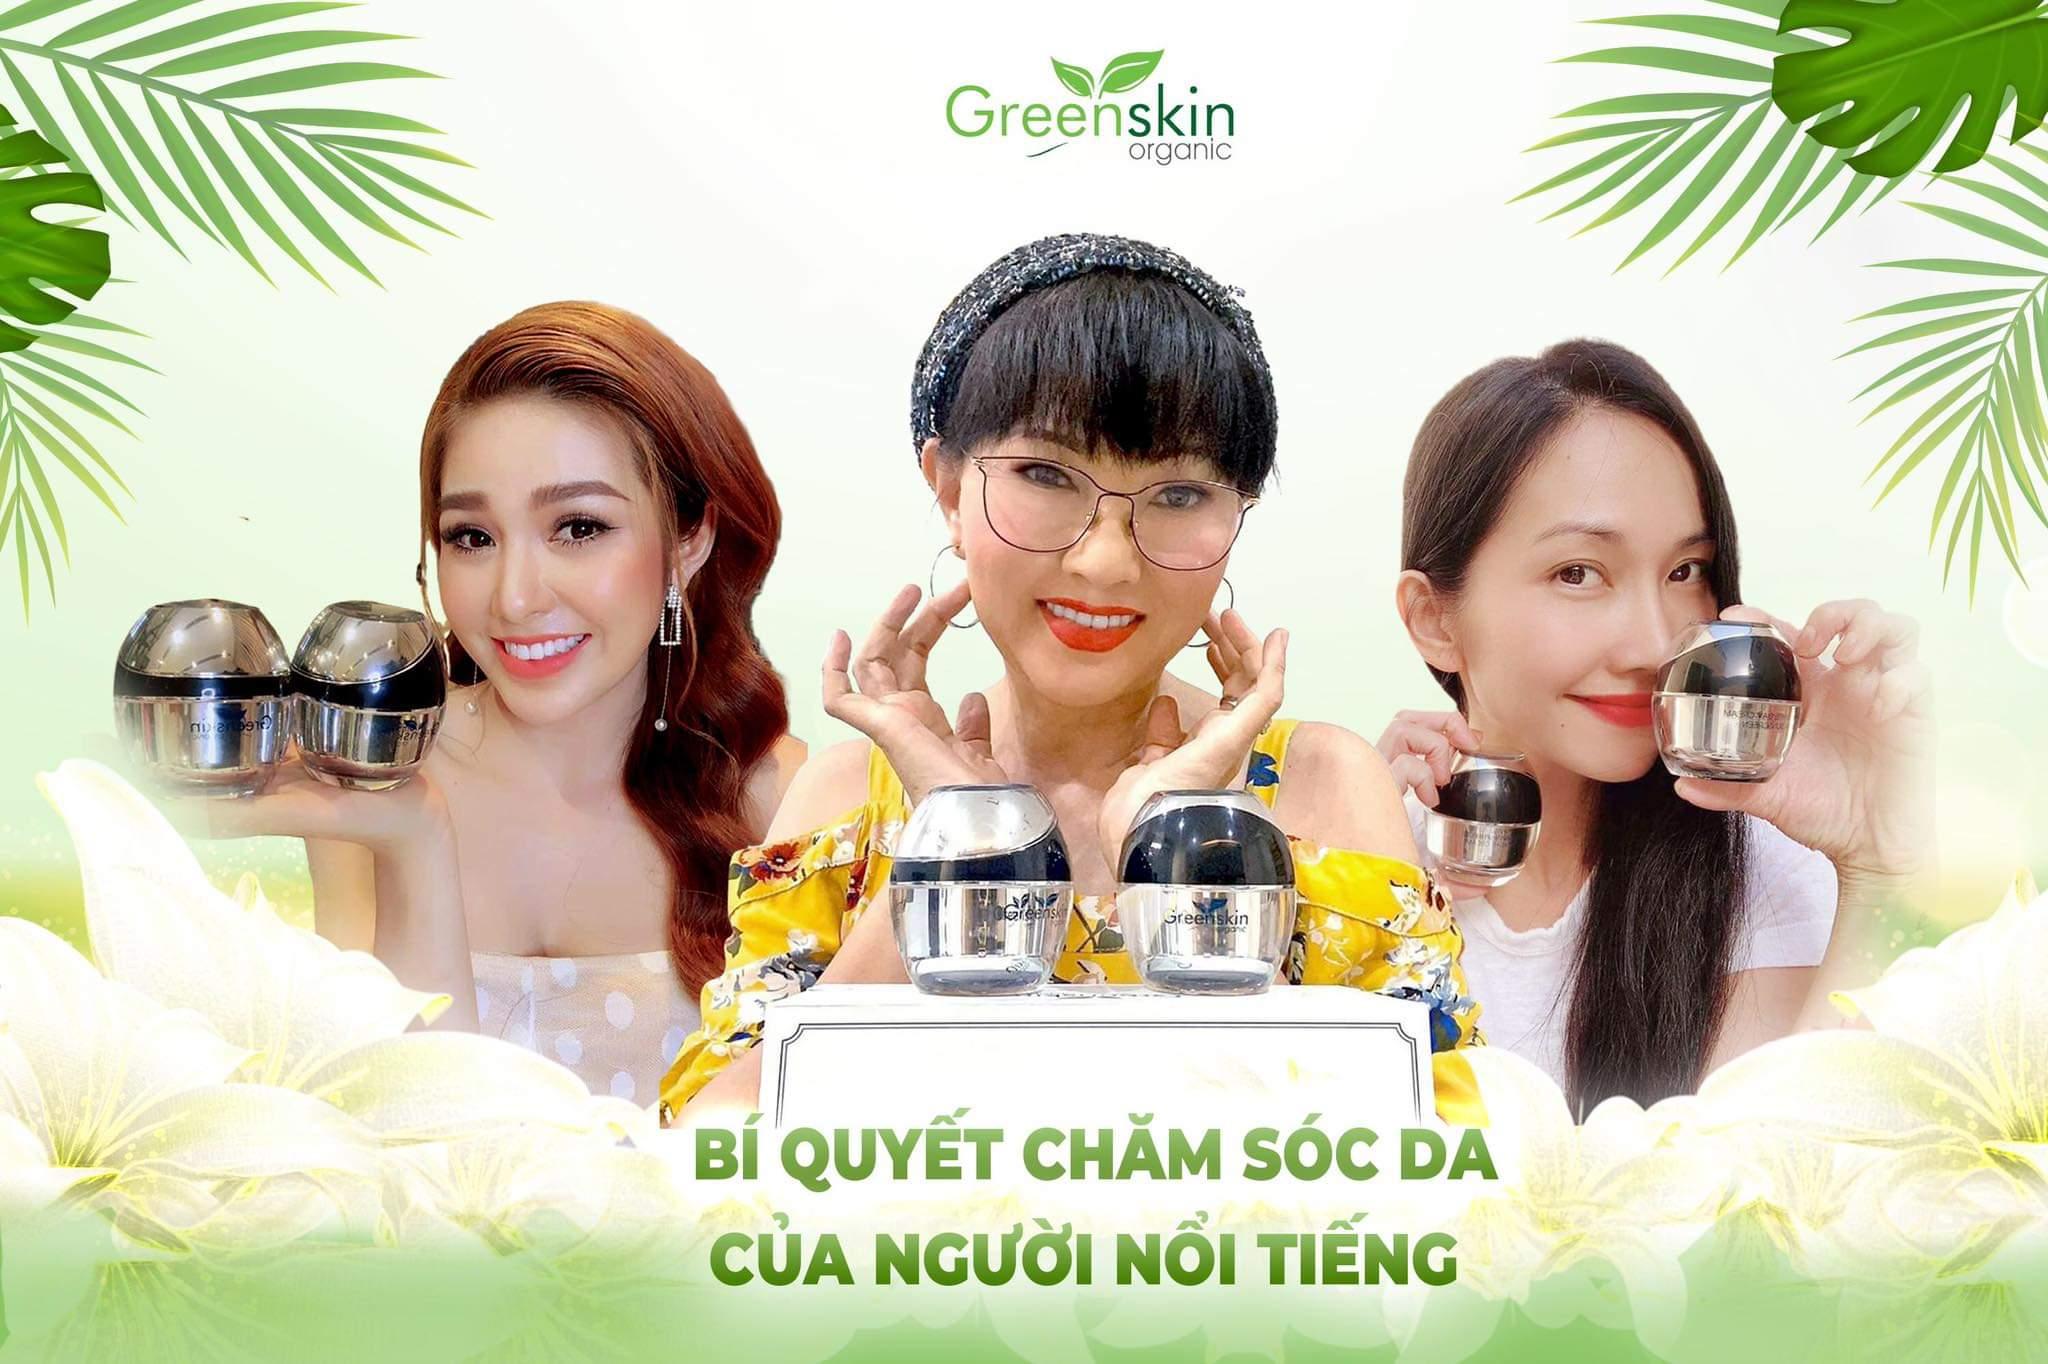 Greenskin-organic-0938866520-myphamlan